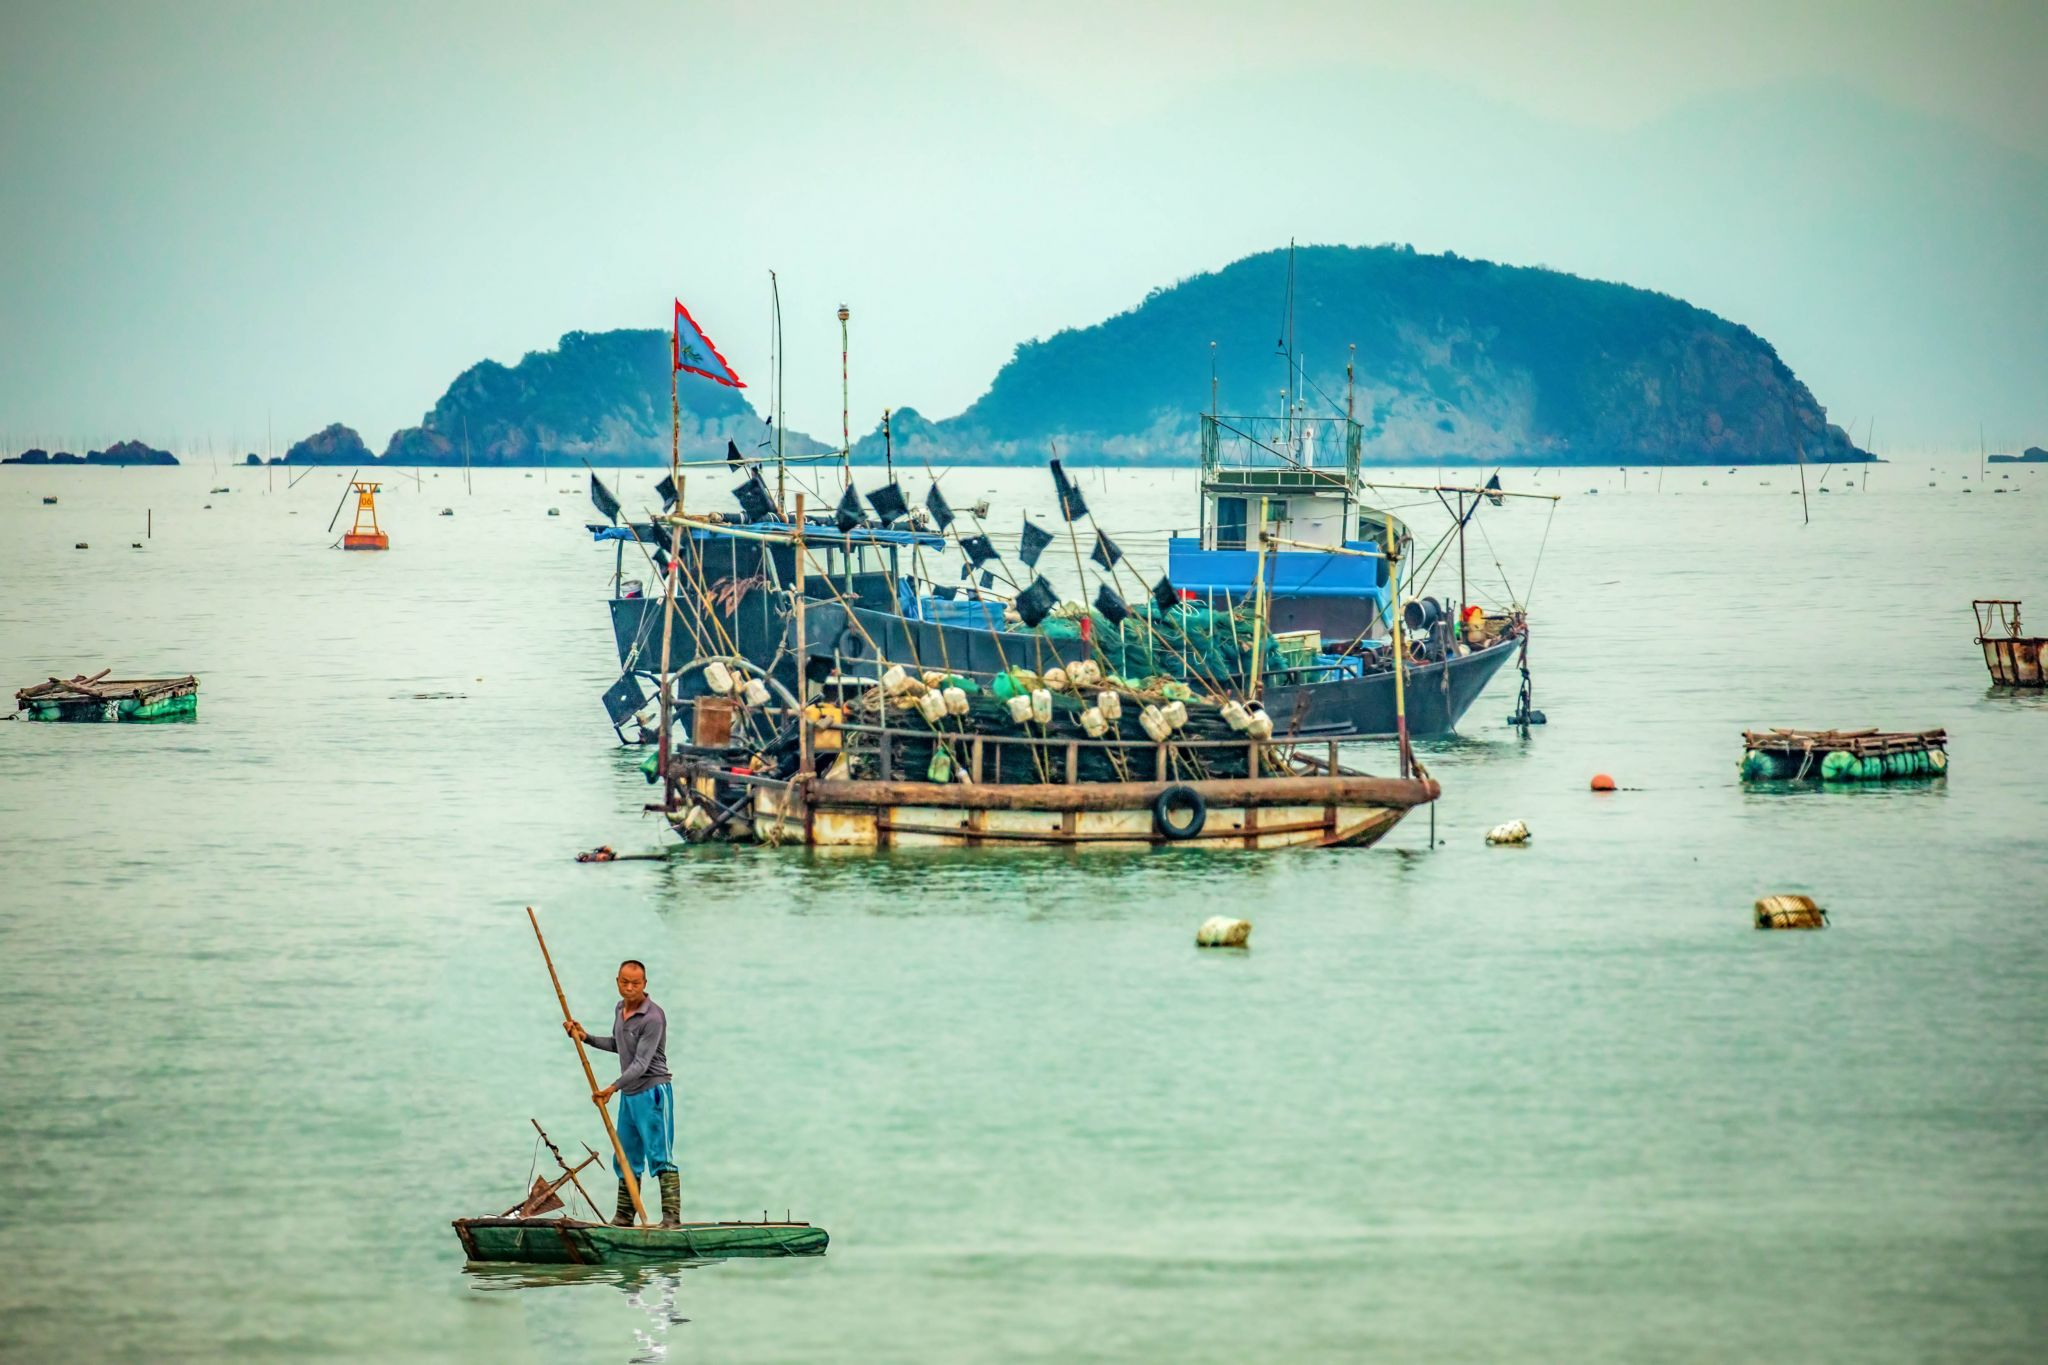 Fisherman returning to shore Xiapu, China